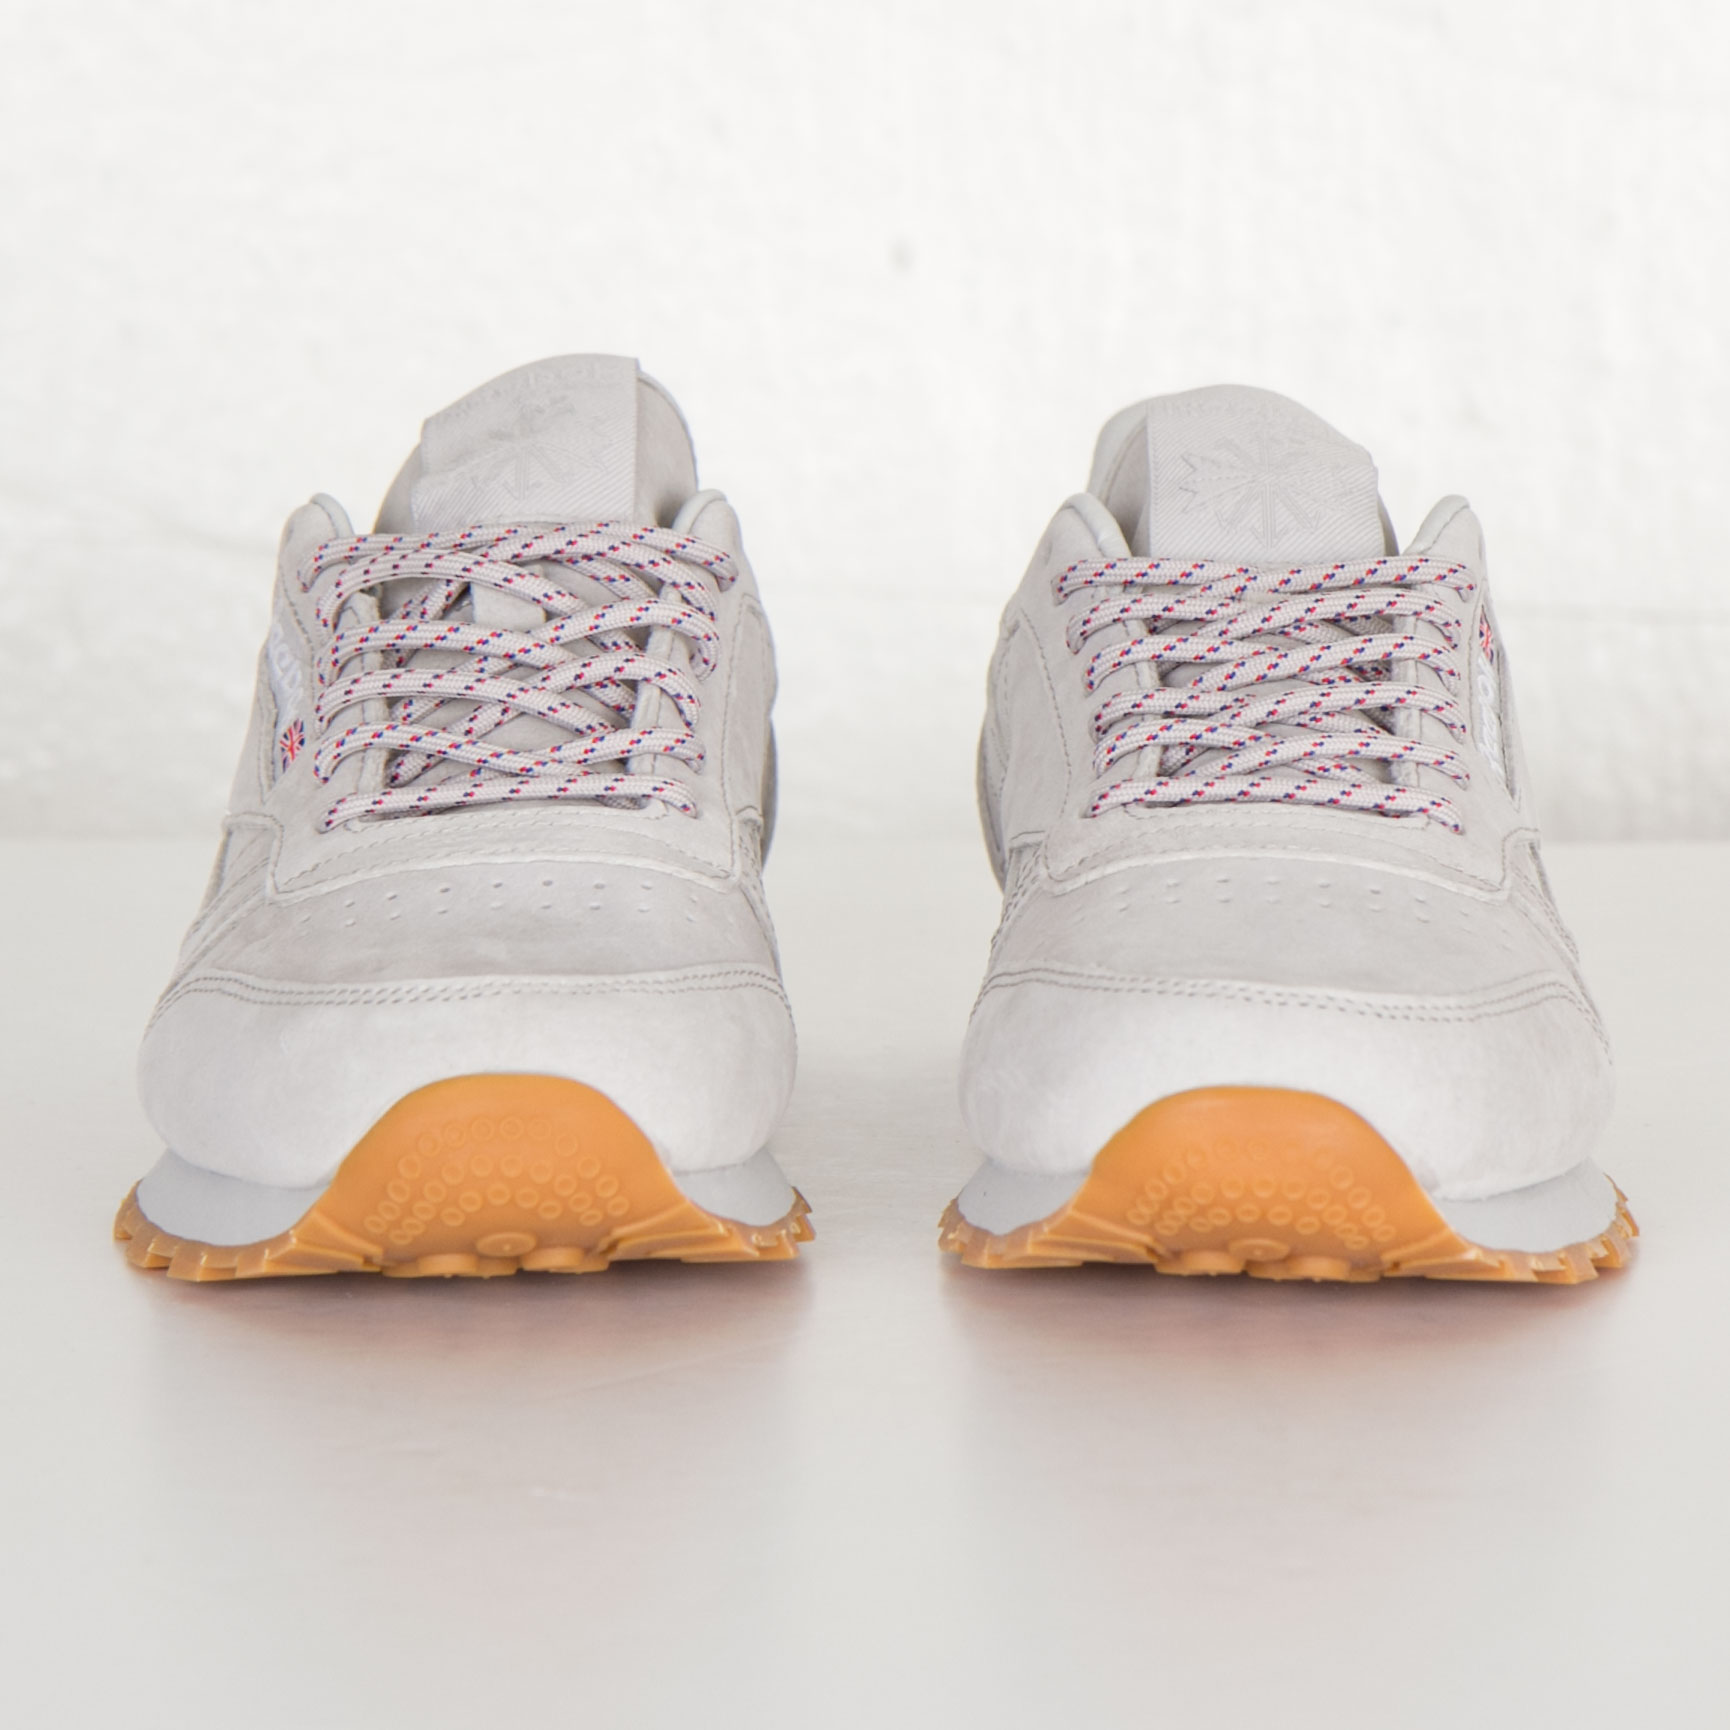 24ed5014ed8 Reebok Classic Leather x Kendrick Lamar - Ar0586 - Sneakersnstuff ...